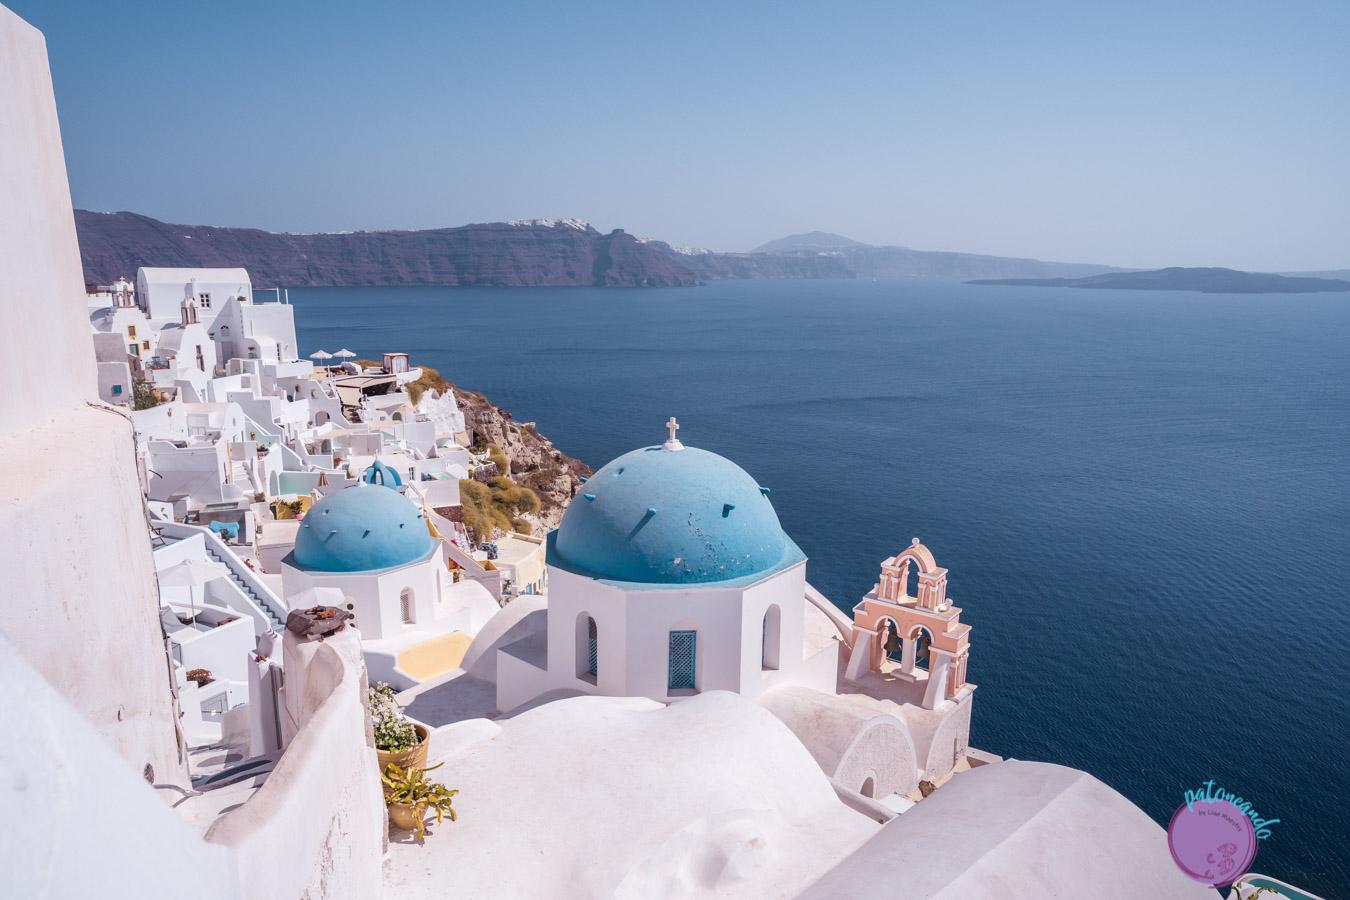 Guia para viajar a Santorini, Grecia - Patoneando blog de viajesDSC00370